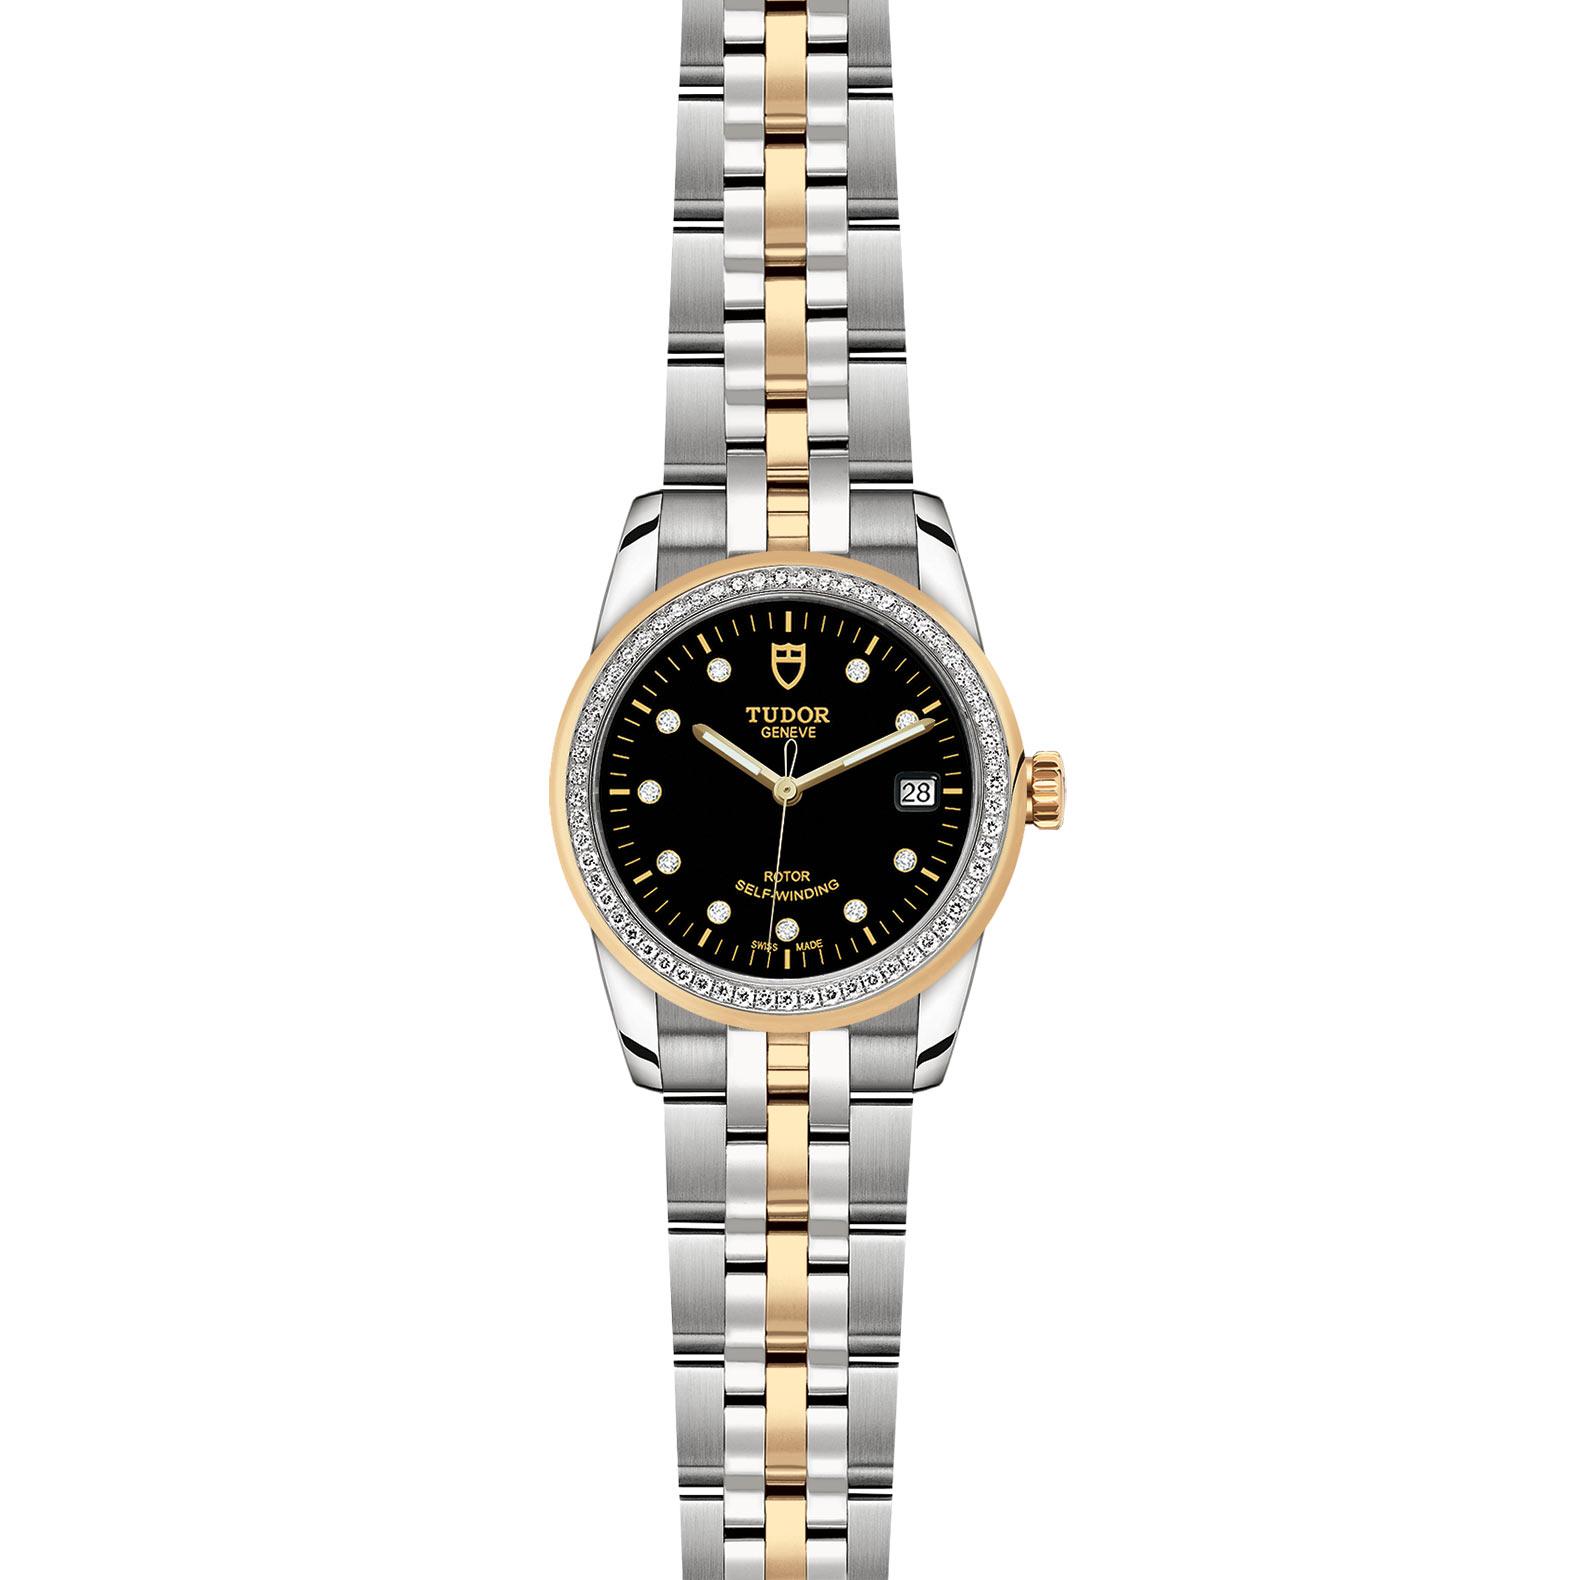 TUDOR Glamour Date M55023 0022 Frontfacing